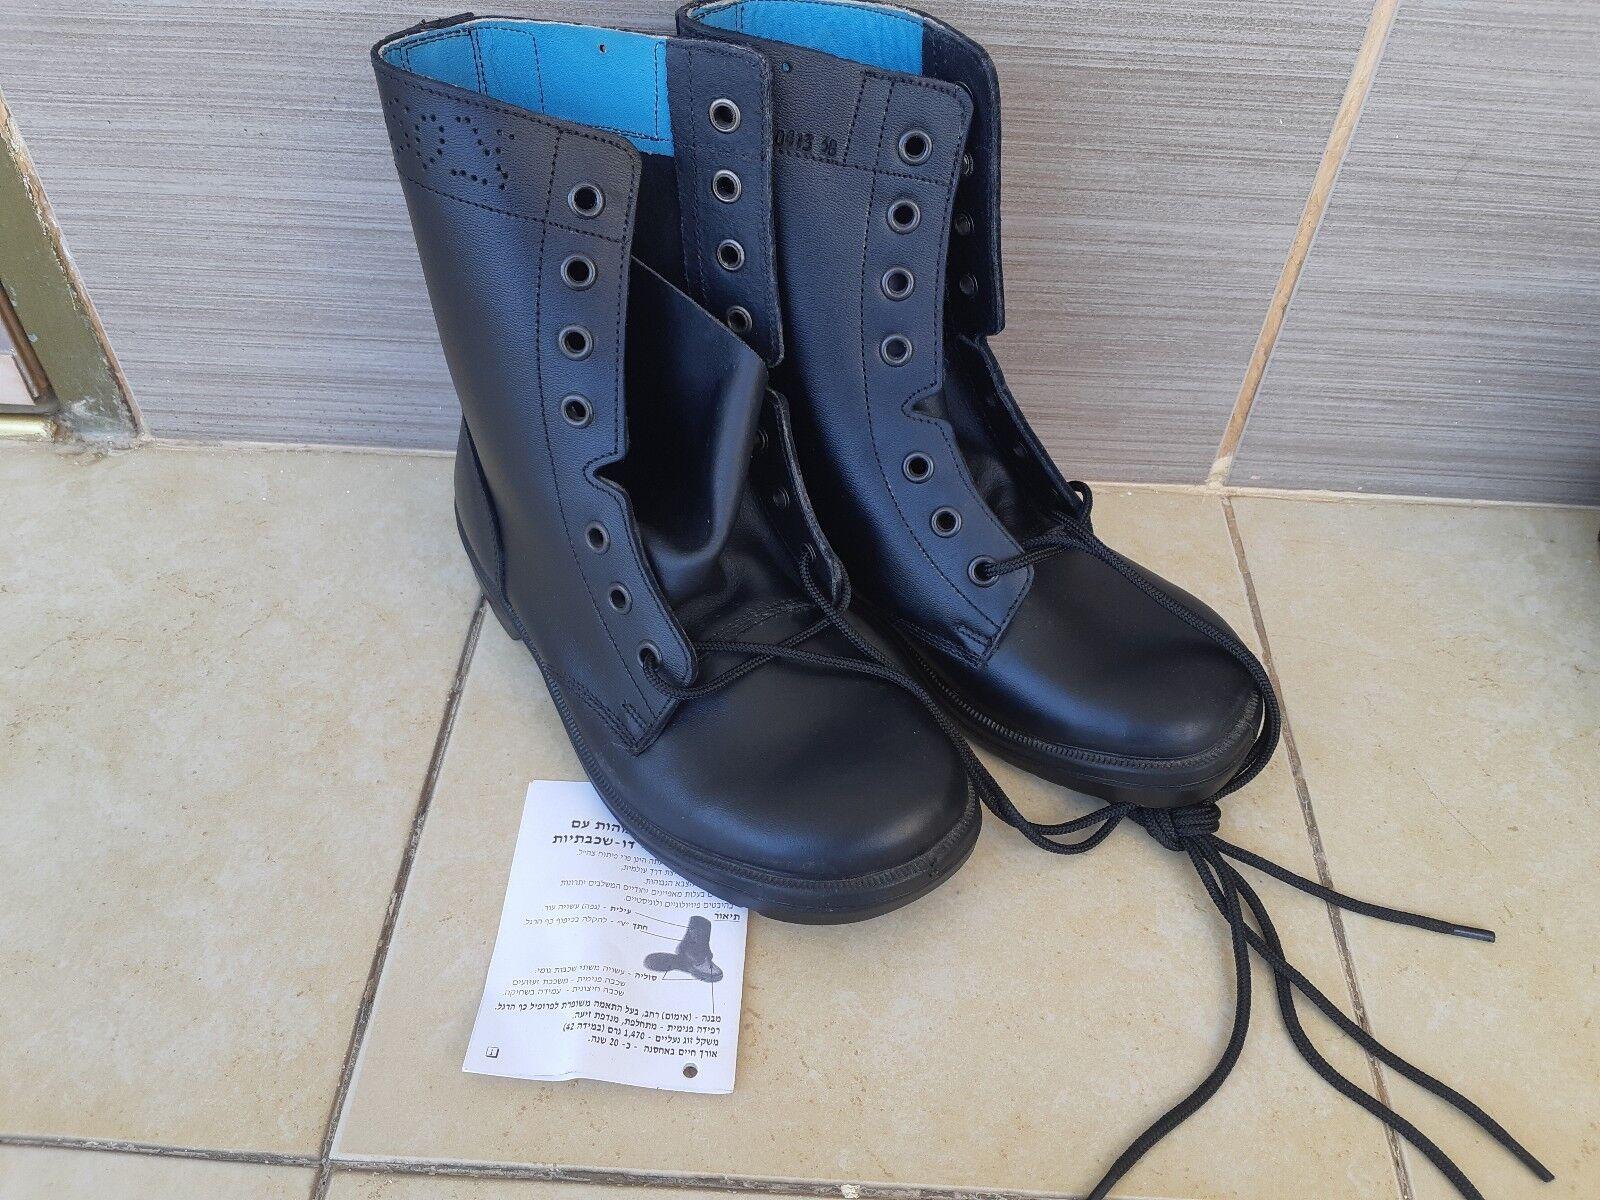 IDF IDF IDF ARMY ZAHAL botas zapatos MILITARY Cuero Work botas  BRILL  Talla  38  us 6  tiendas minoristas